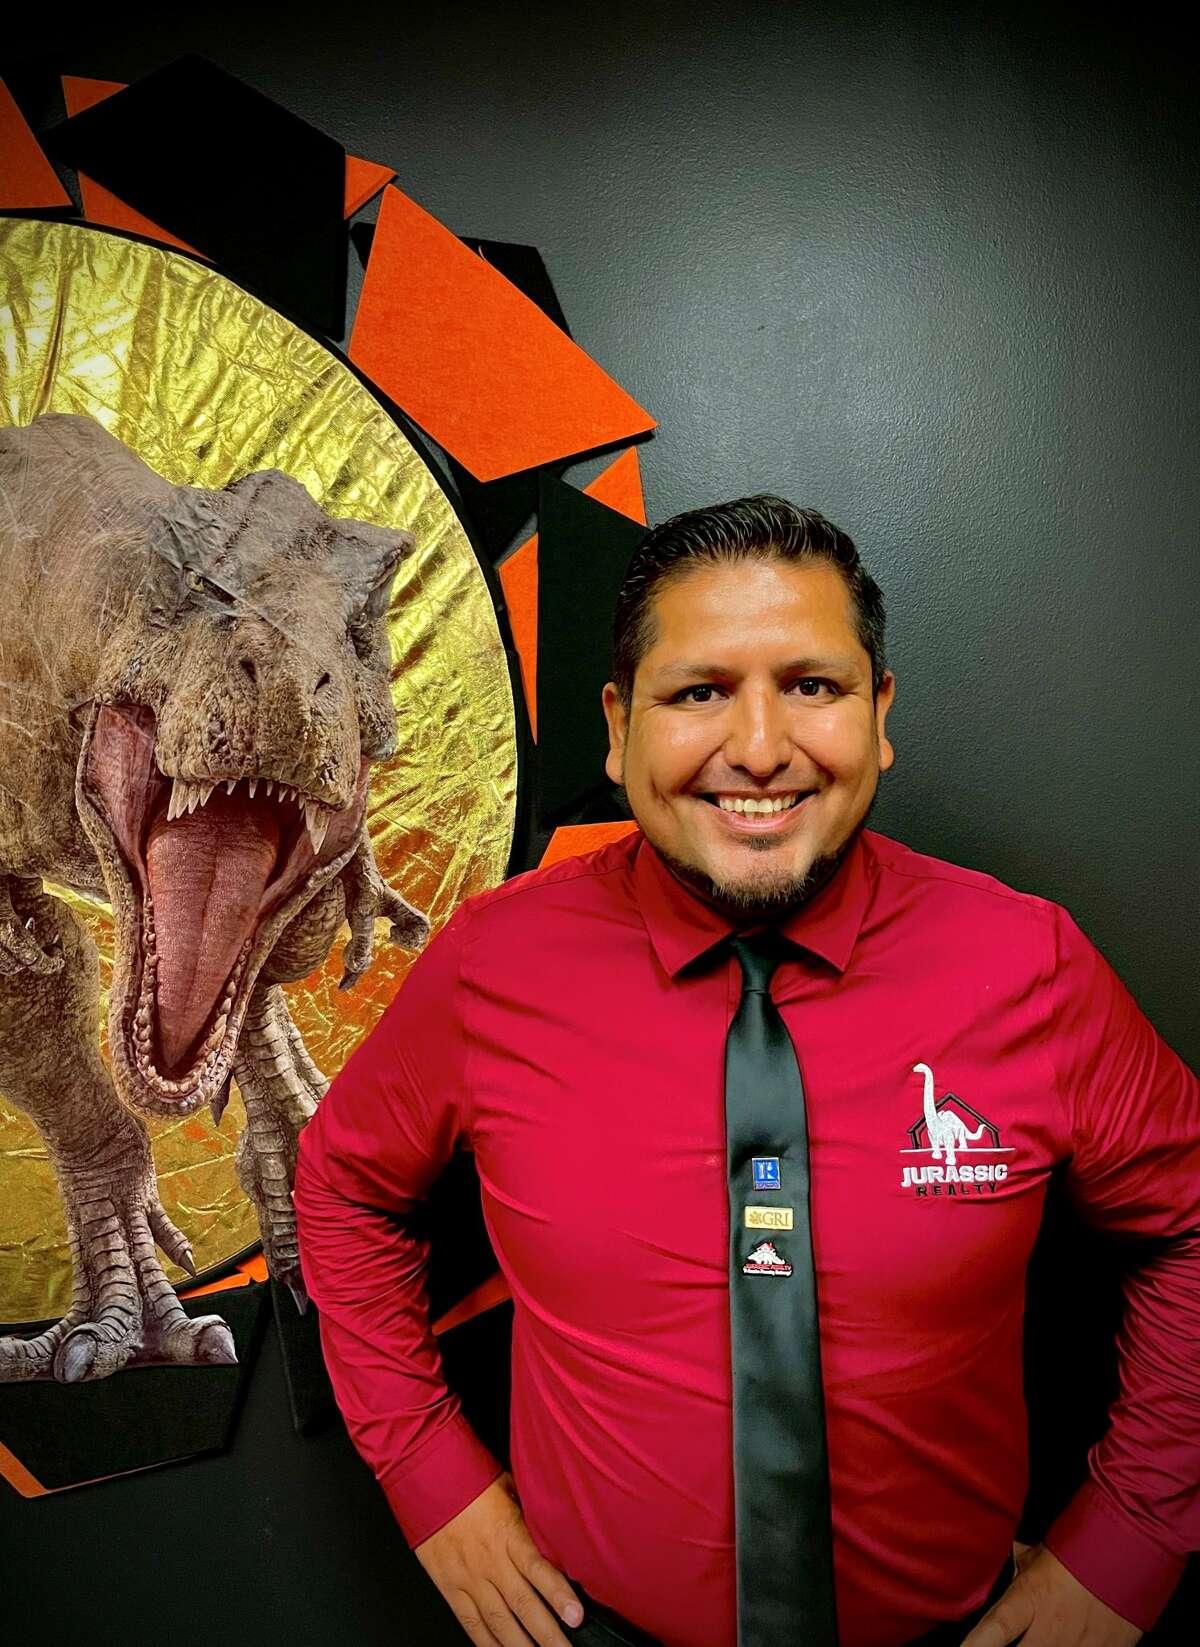 San Antonio broker Robert Gomez owns and operates Jurassic Realty.